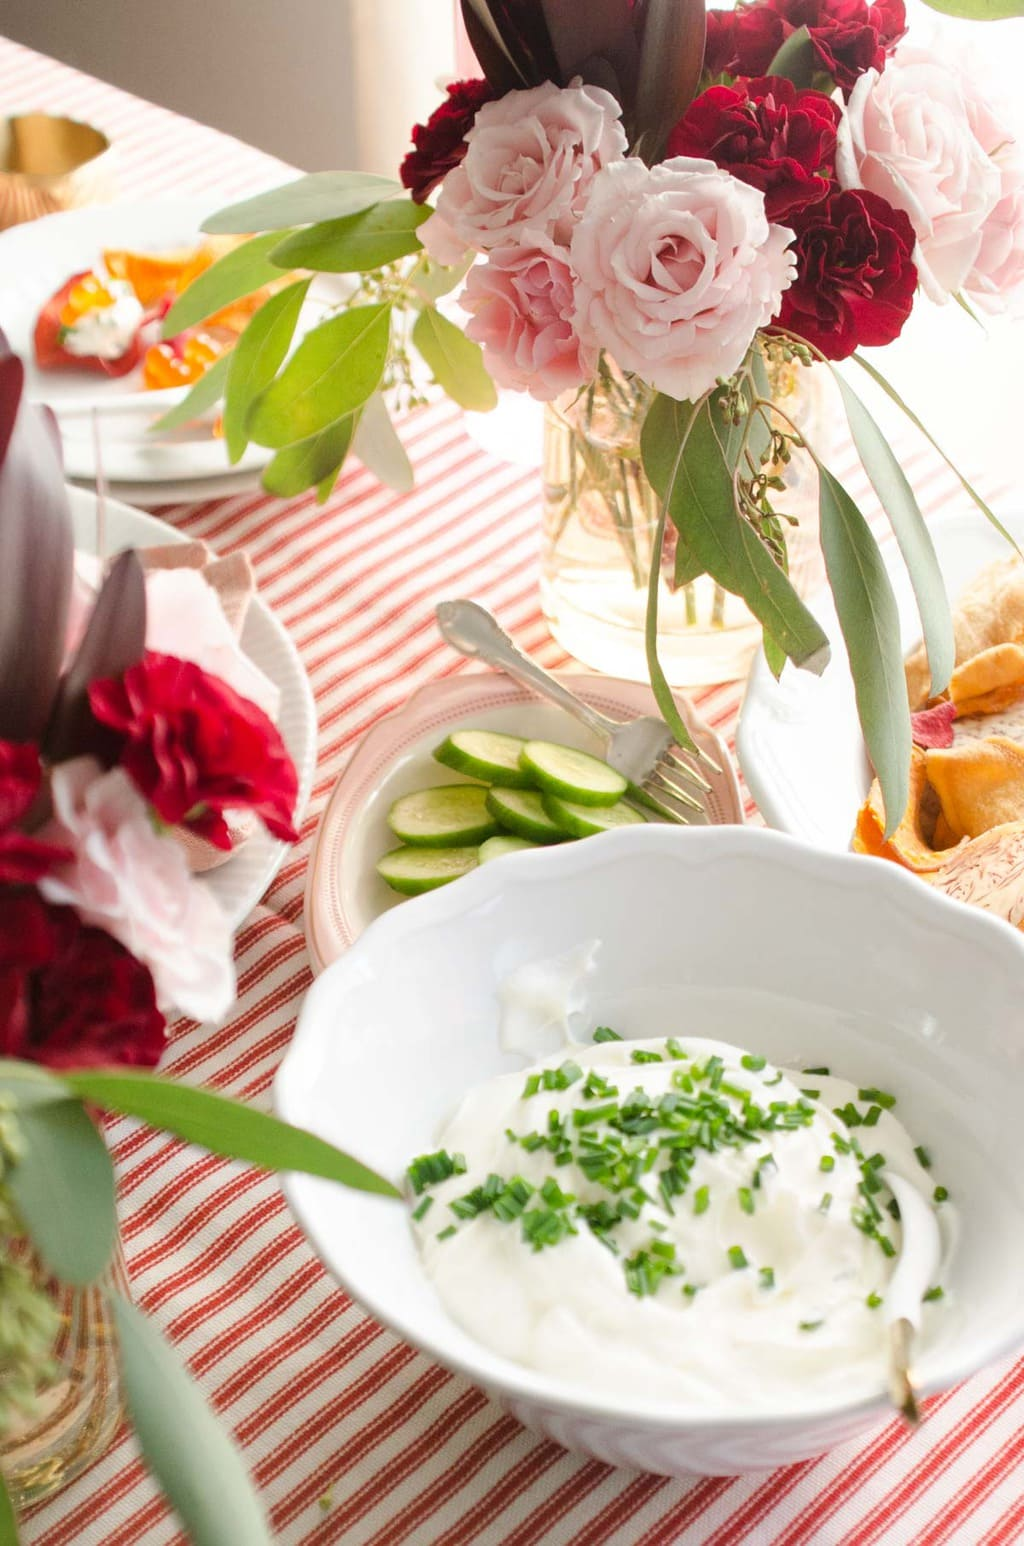 Salmon roe and creme fraîche via @thouswellblog